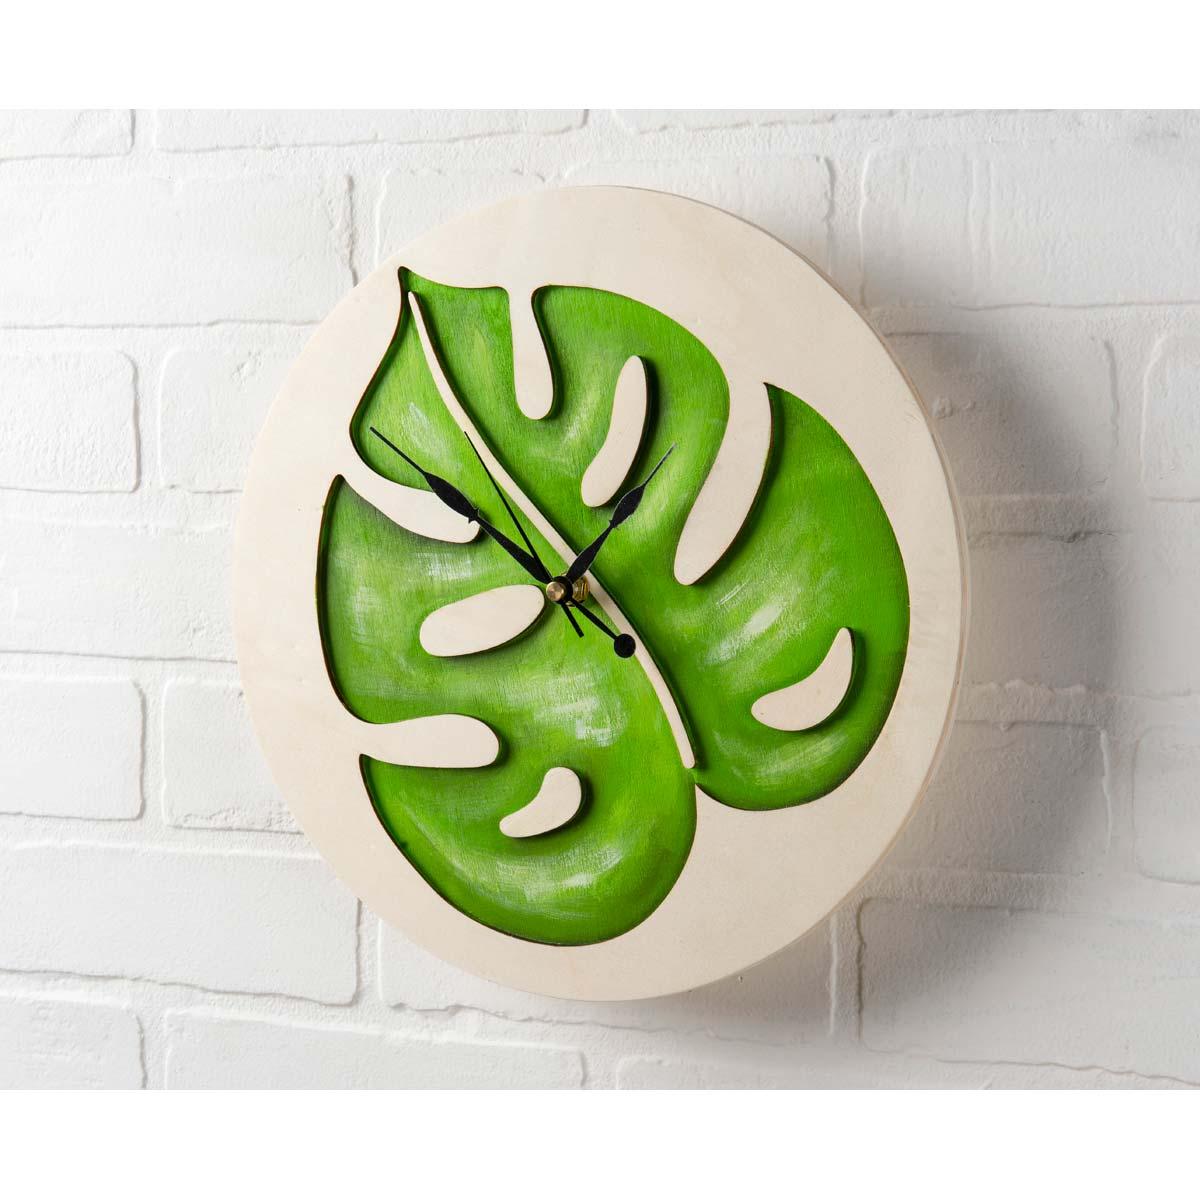 Mod Podge ® Resin Pouring Surface - Leaf Plaque - 56652E